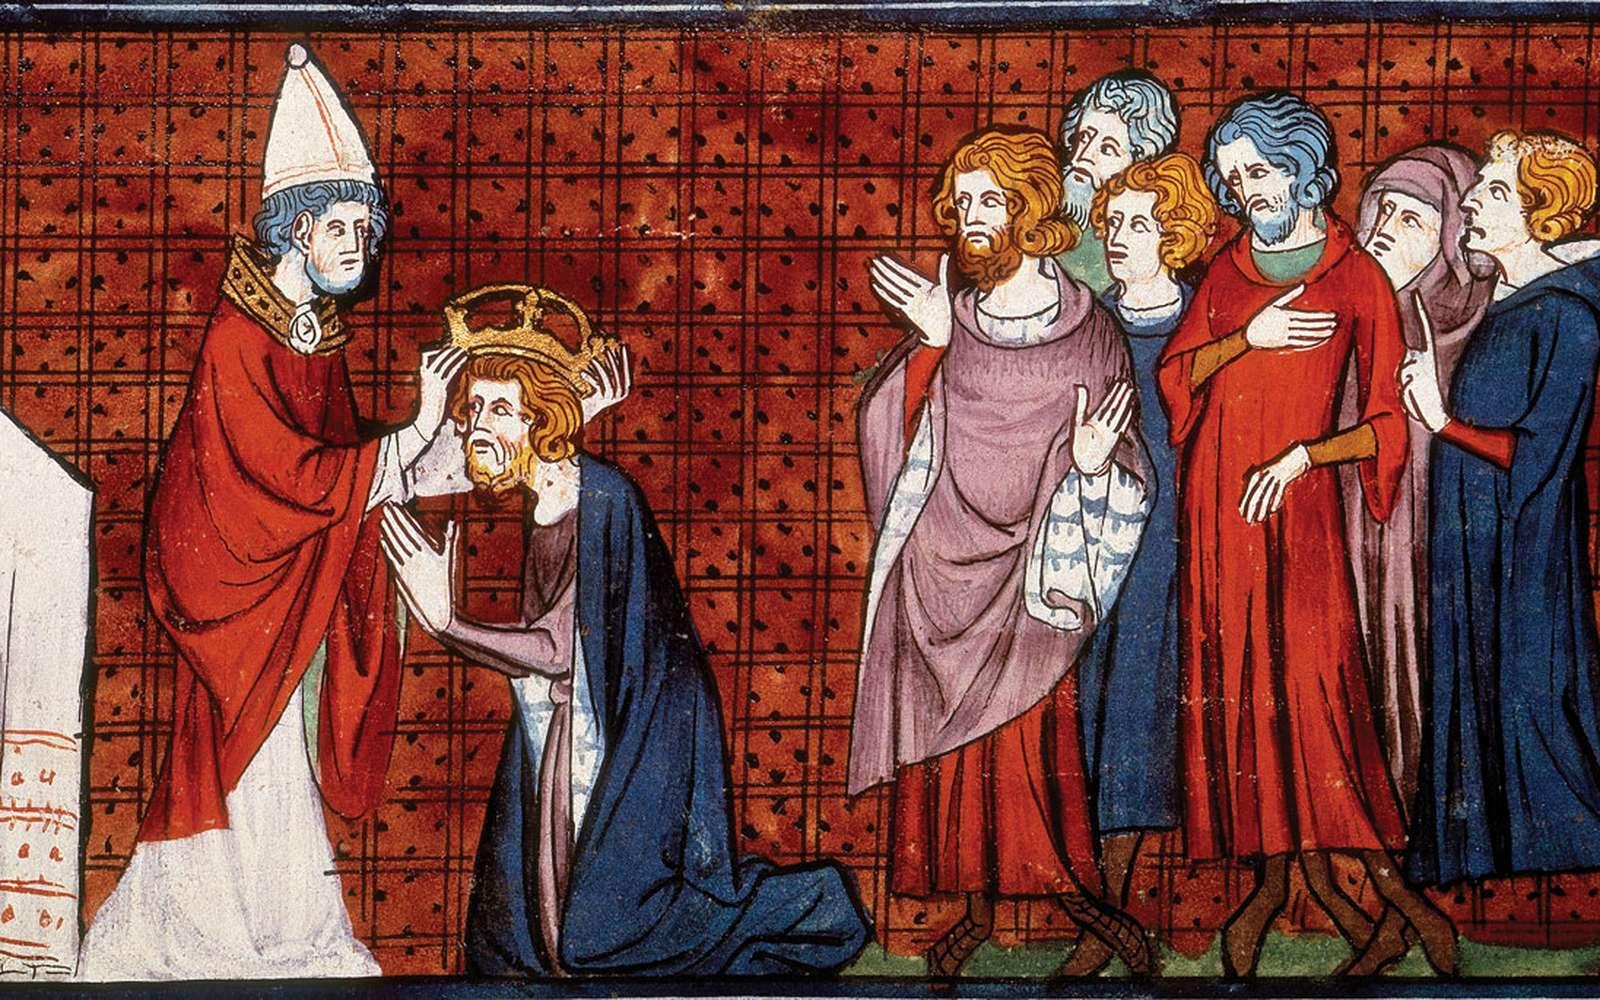 Le pape Léon III fit Charlemagne empereur en l'an 800. © Wikimedia Commons, DP